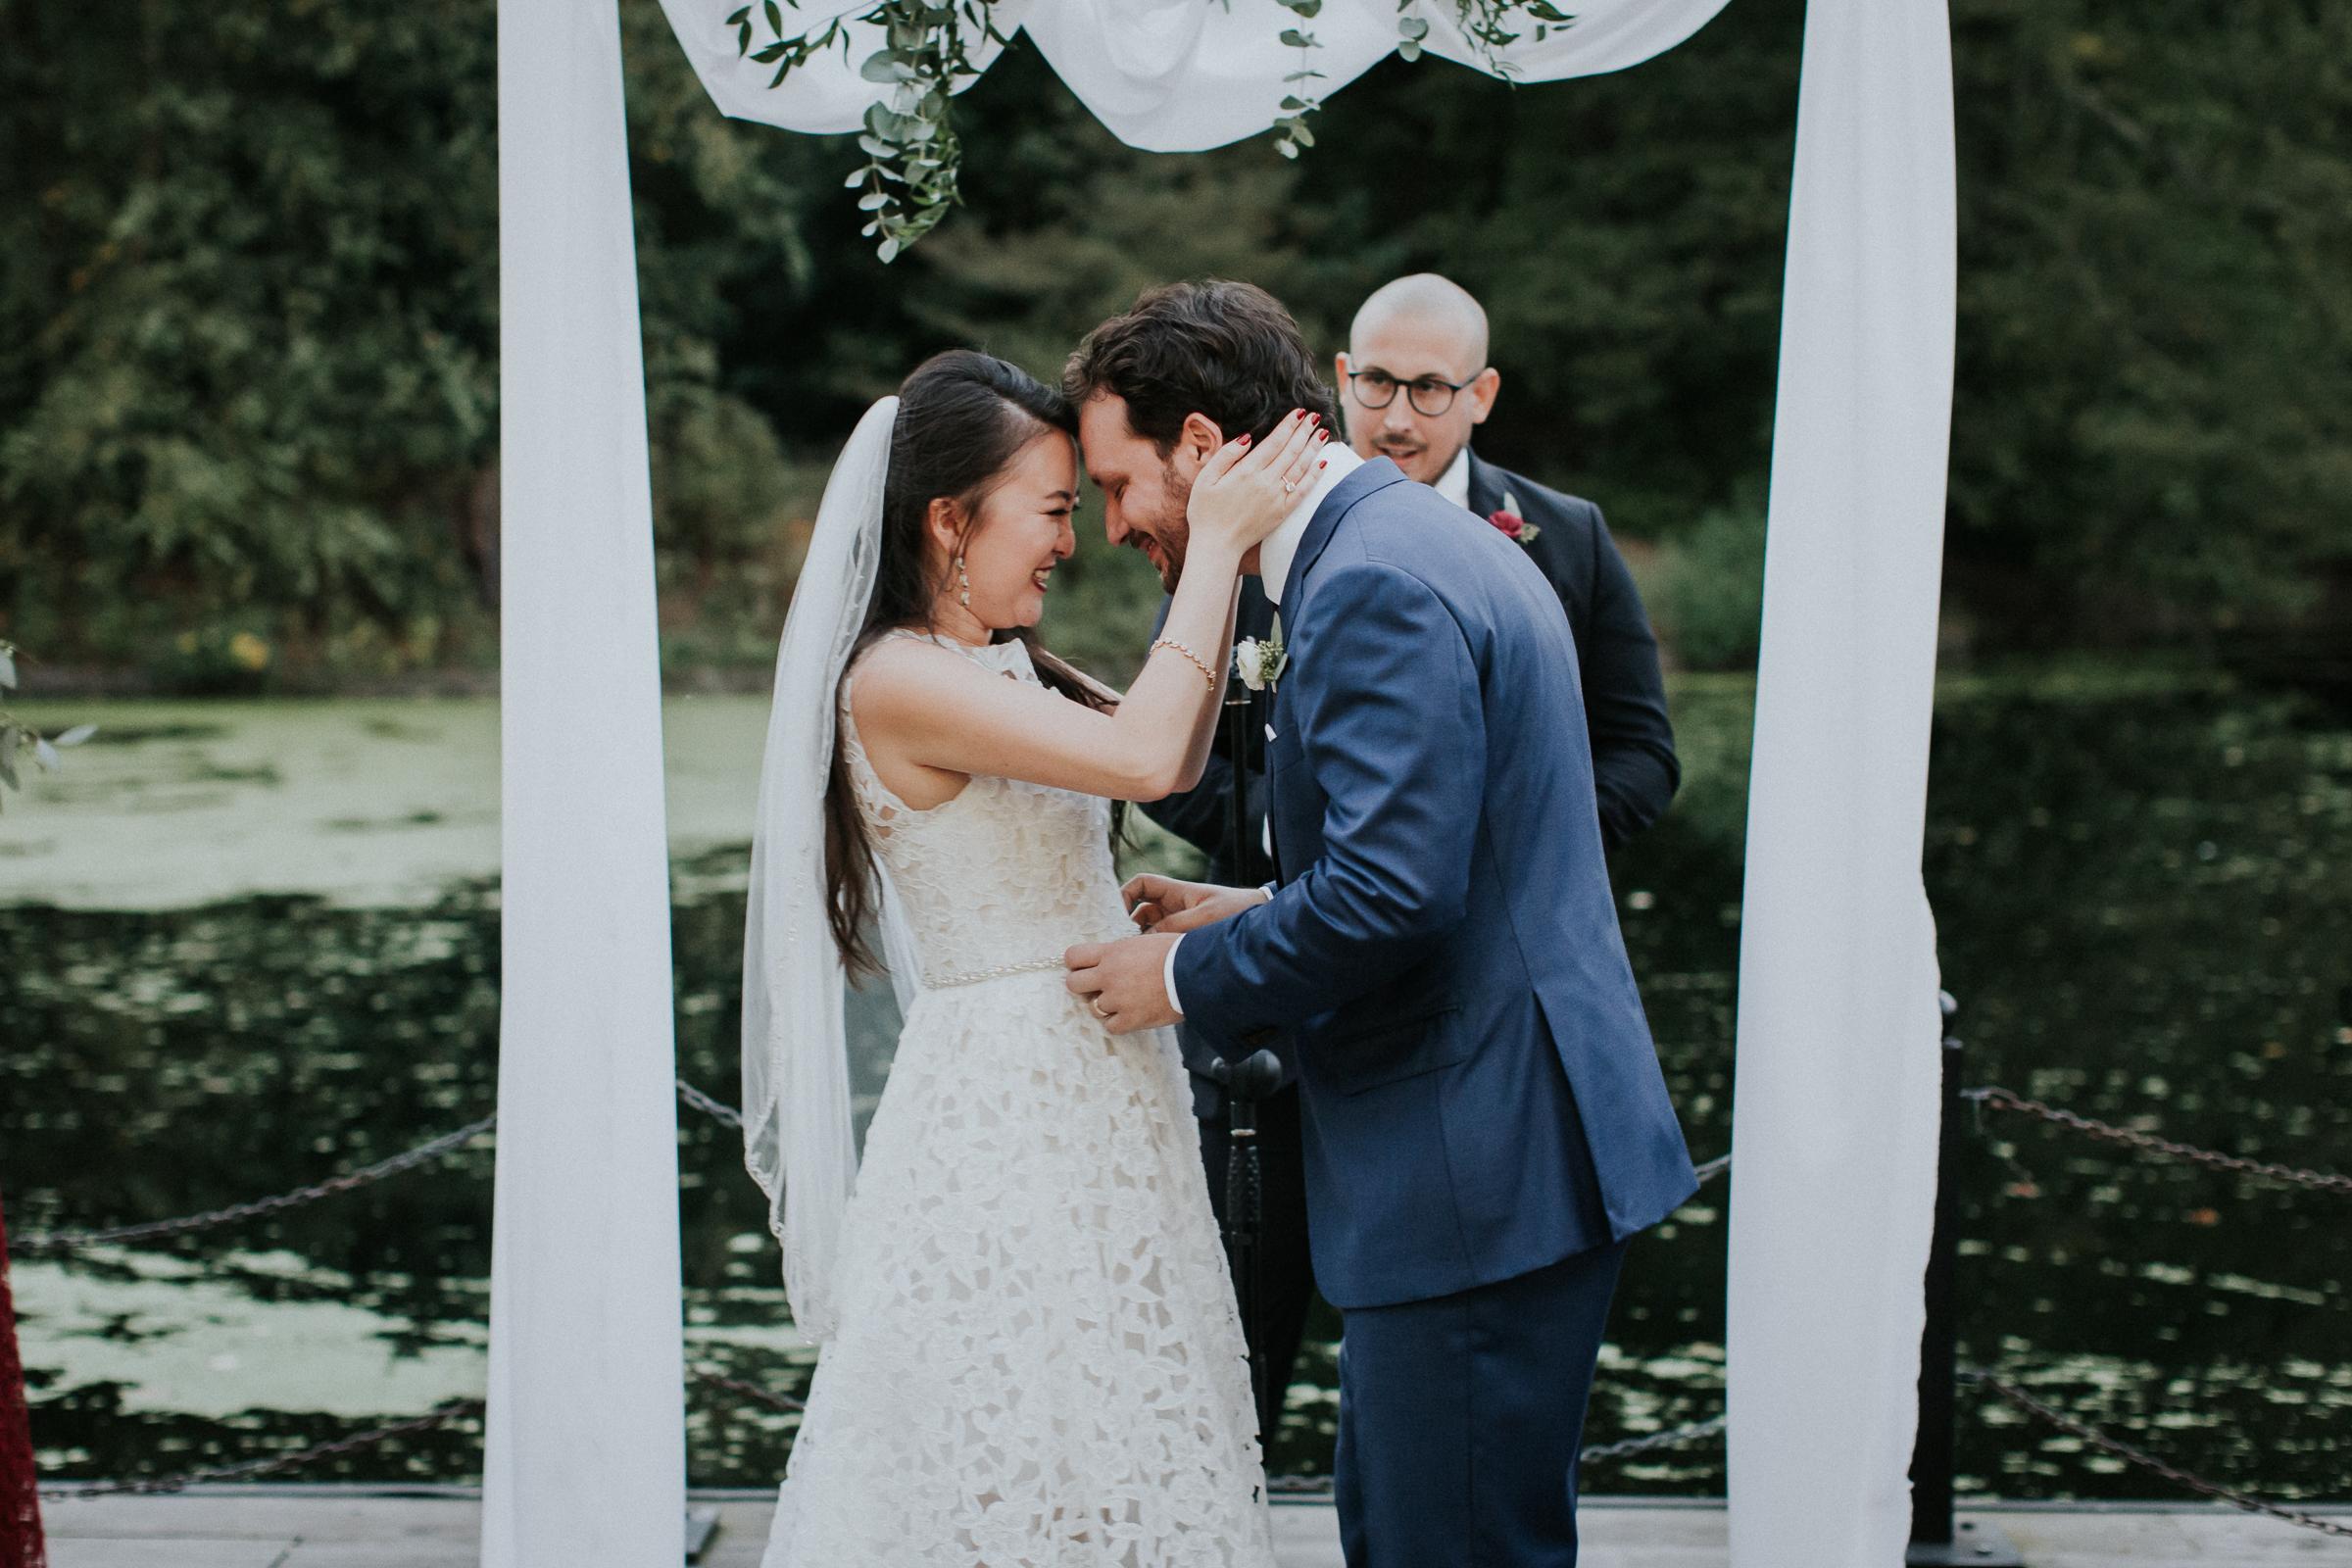 Prospect-Park-Boathouse-Artistic-Documentary-Wedding-Photographer-63.jpg